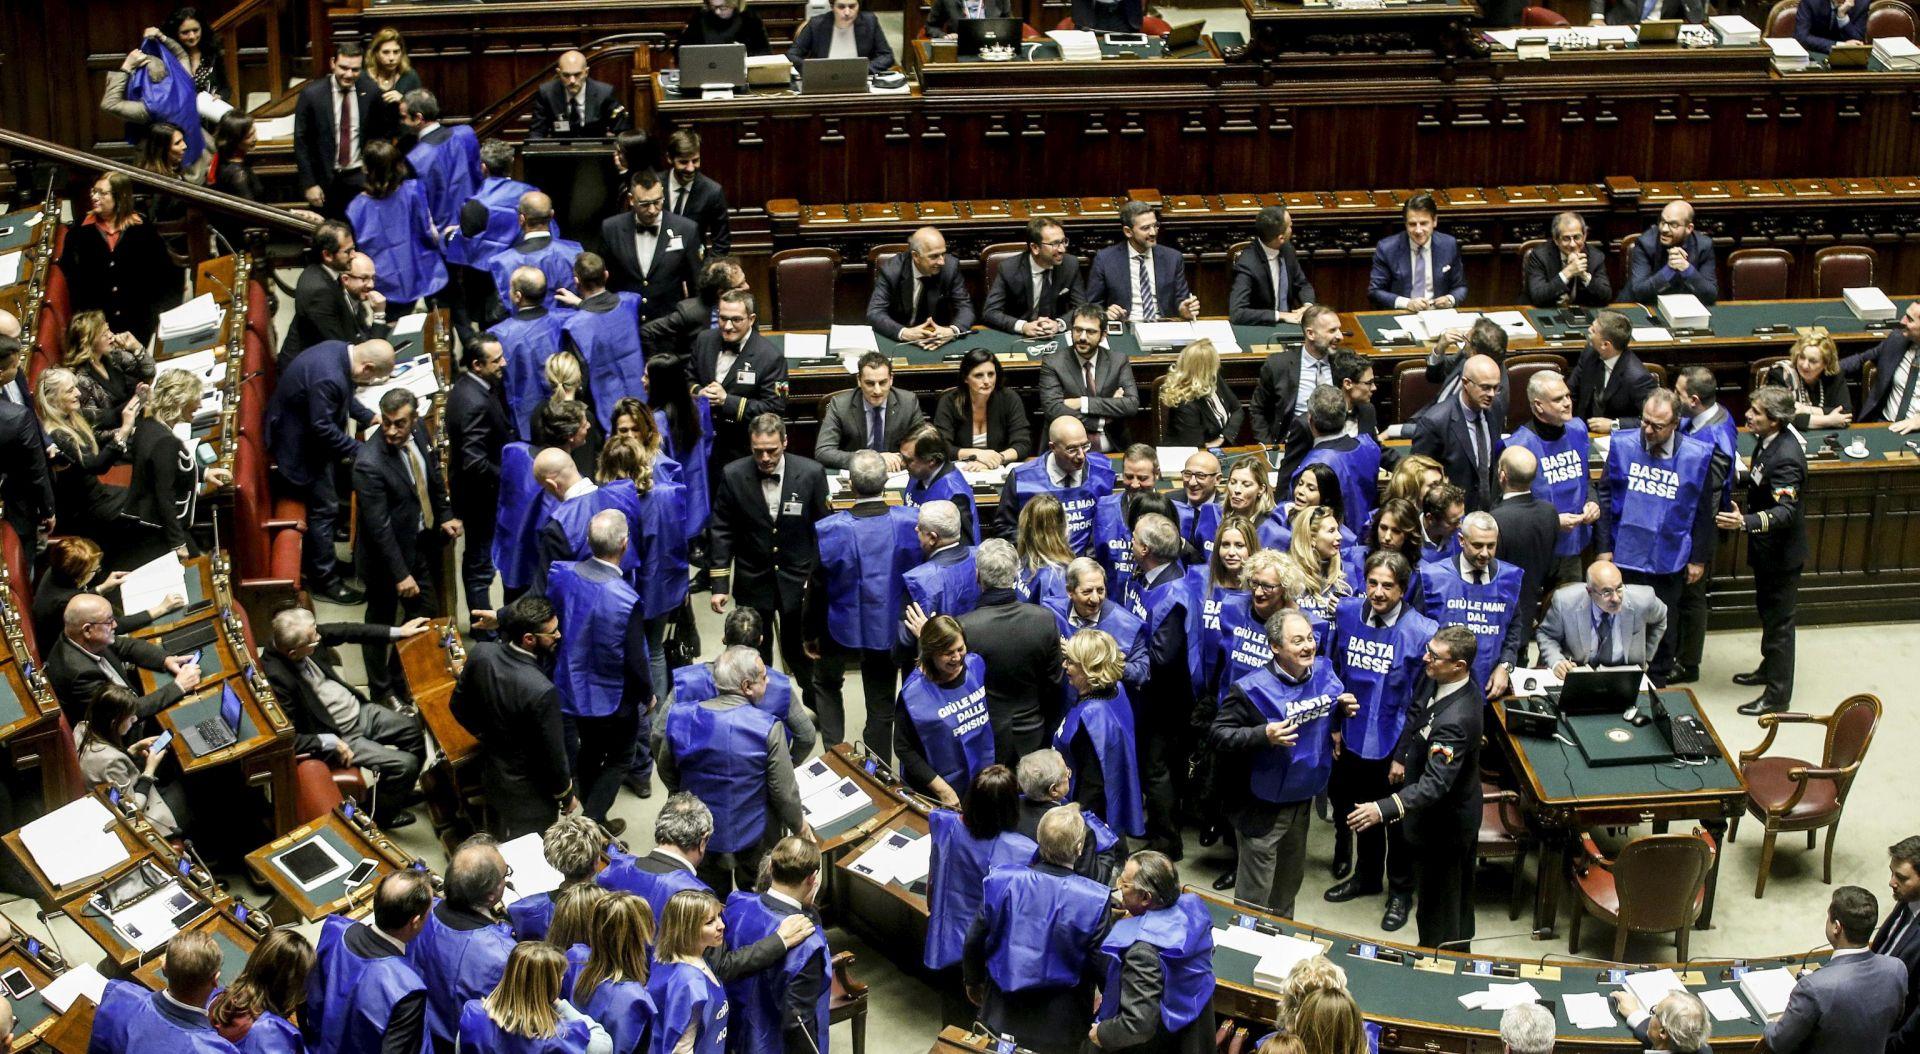 Talijanski parlament prihvatio revidiran proračun za 2019.